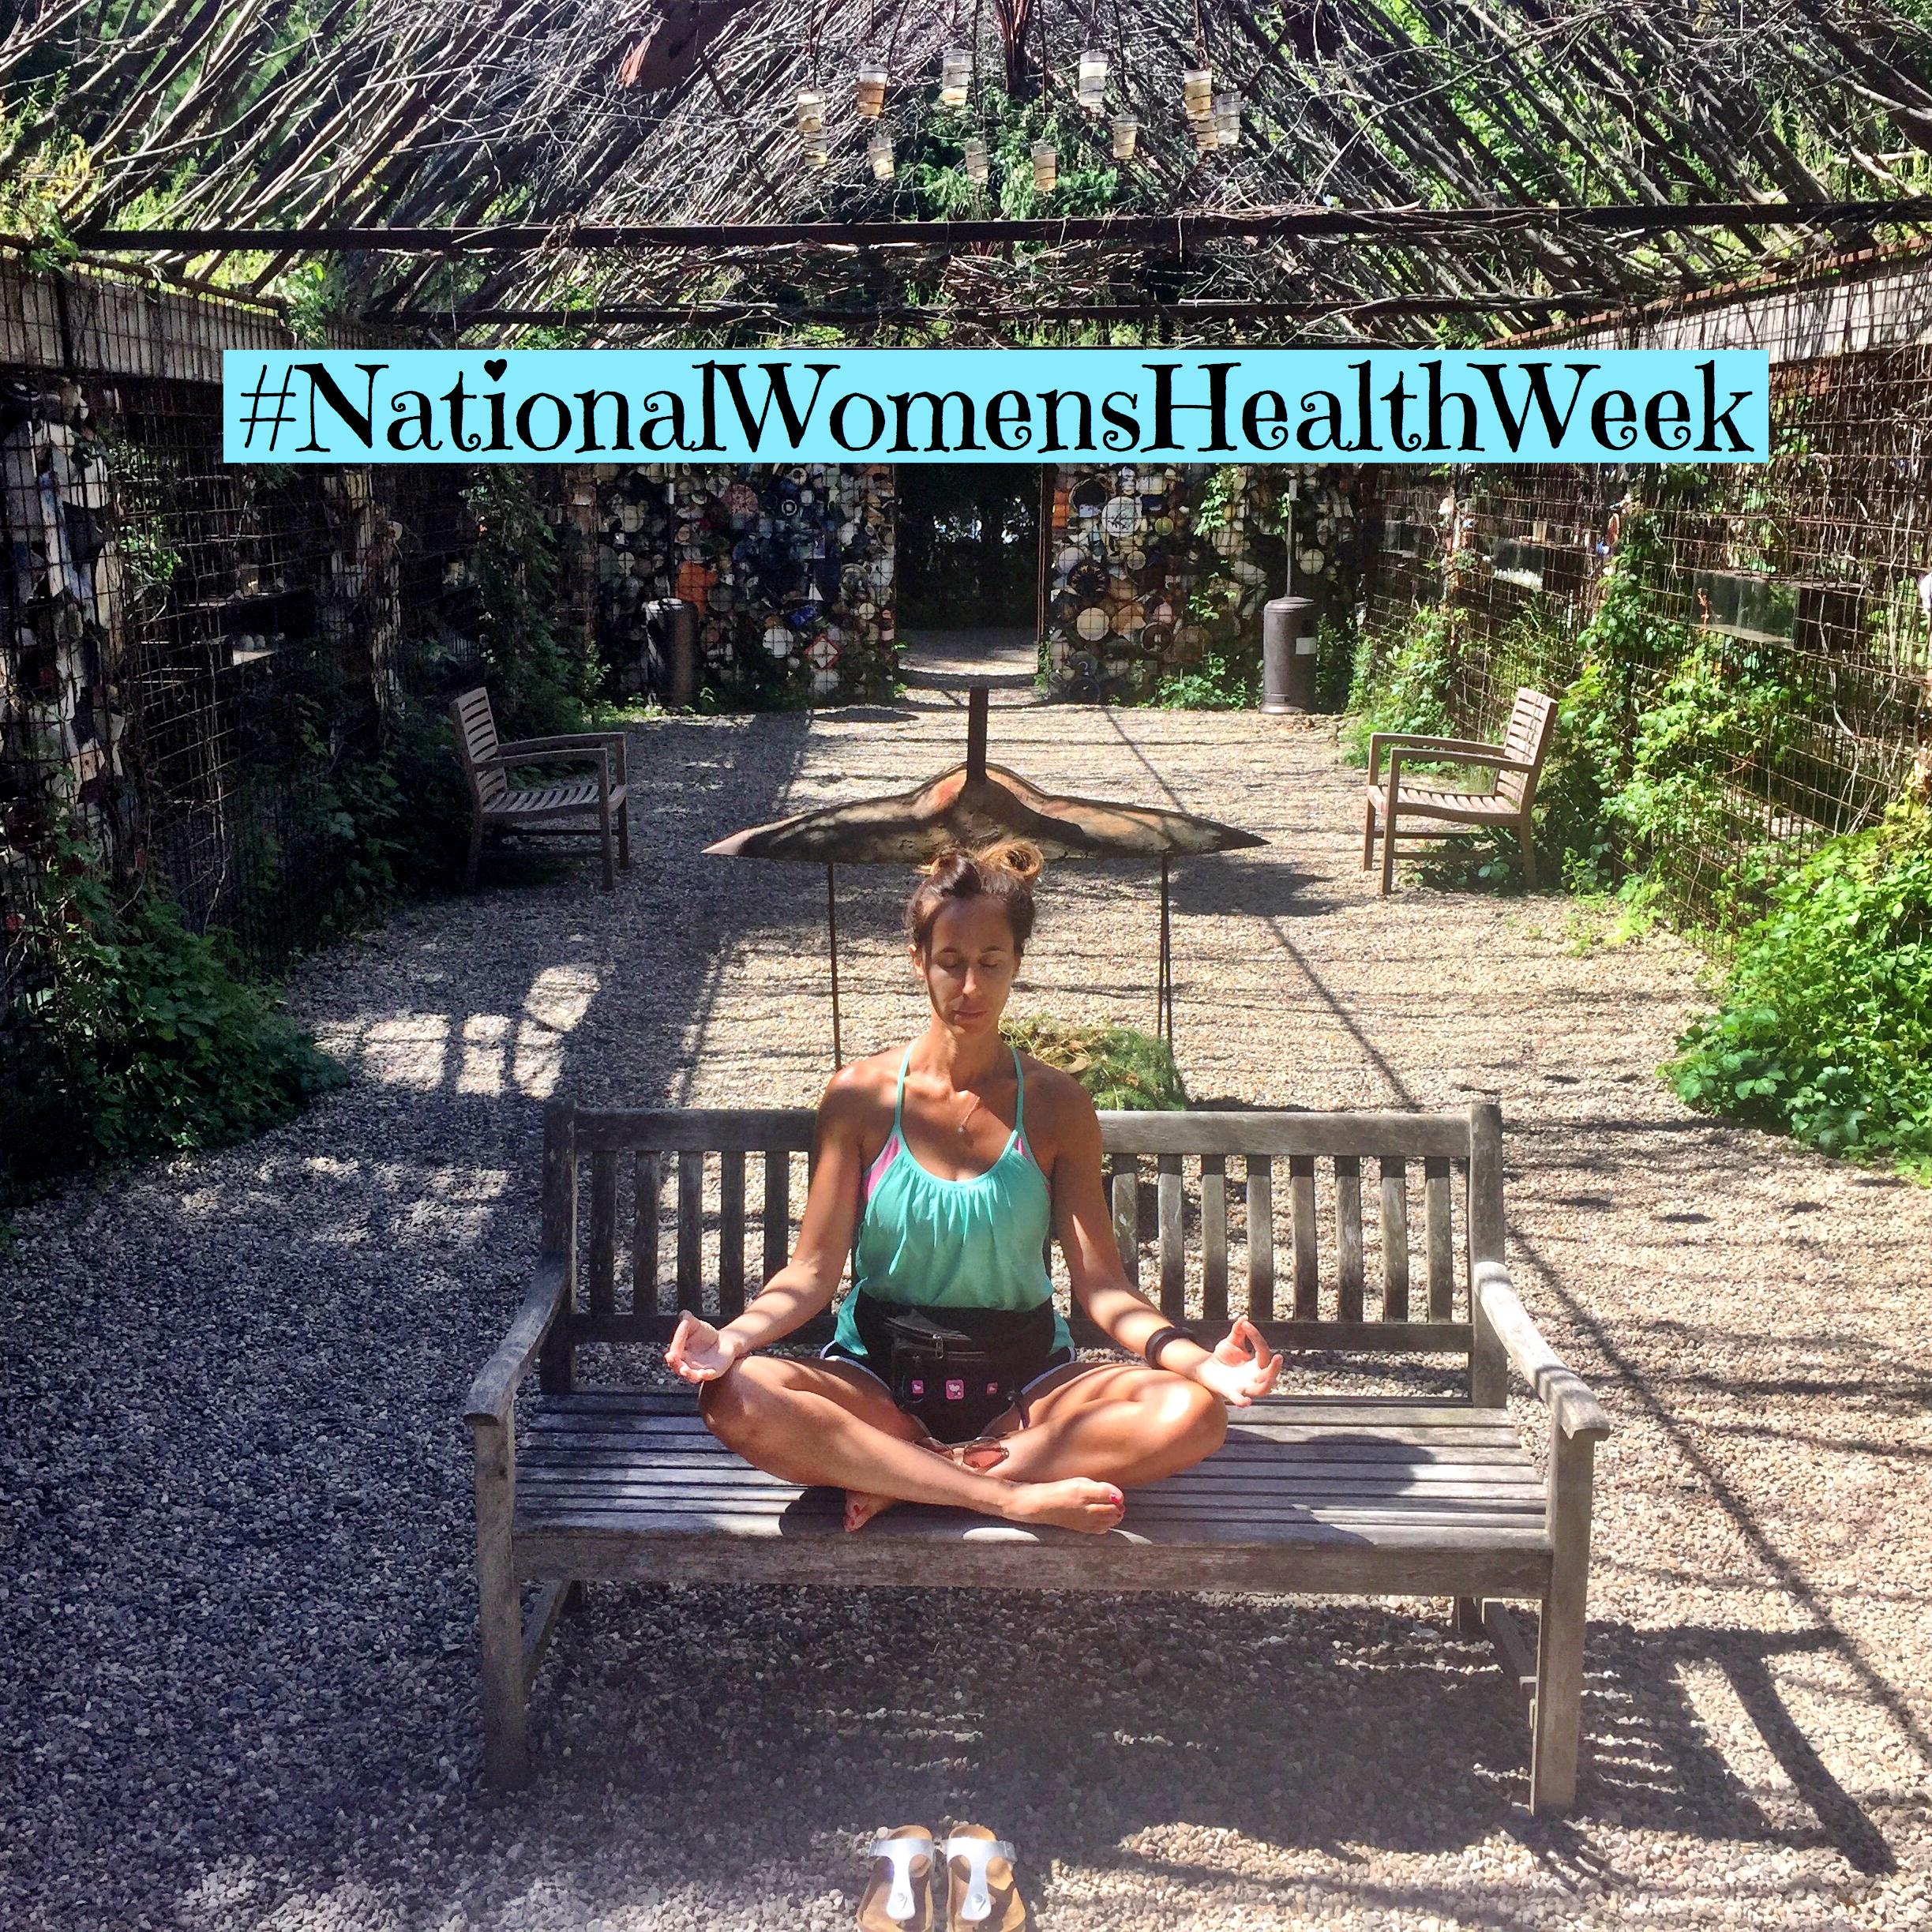 Happy #NationalWomensHealthWeek!